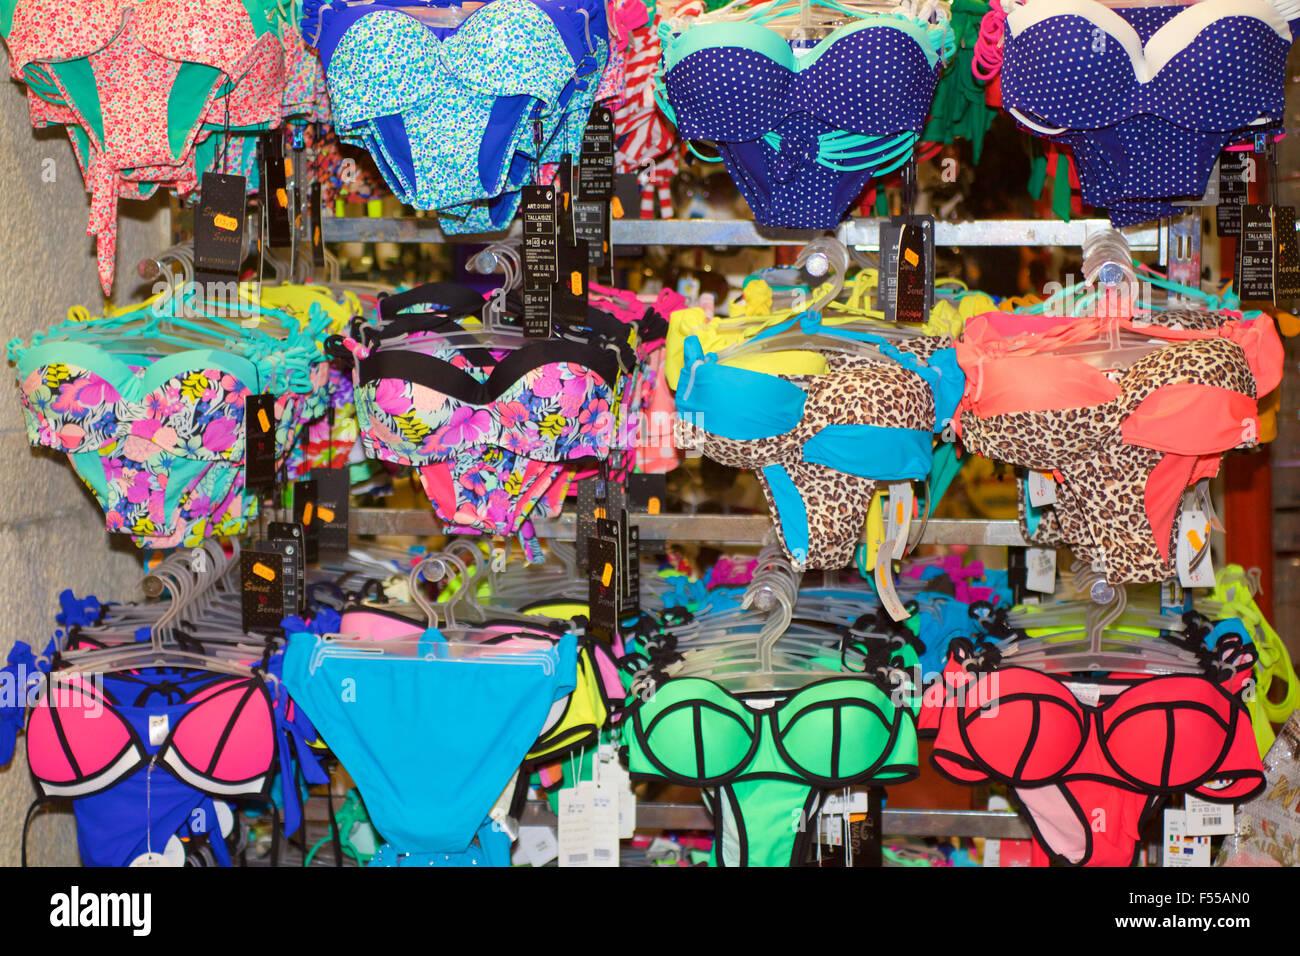 A shop display of brightly coloured bikini swimwear. - Stock Image